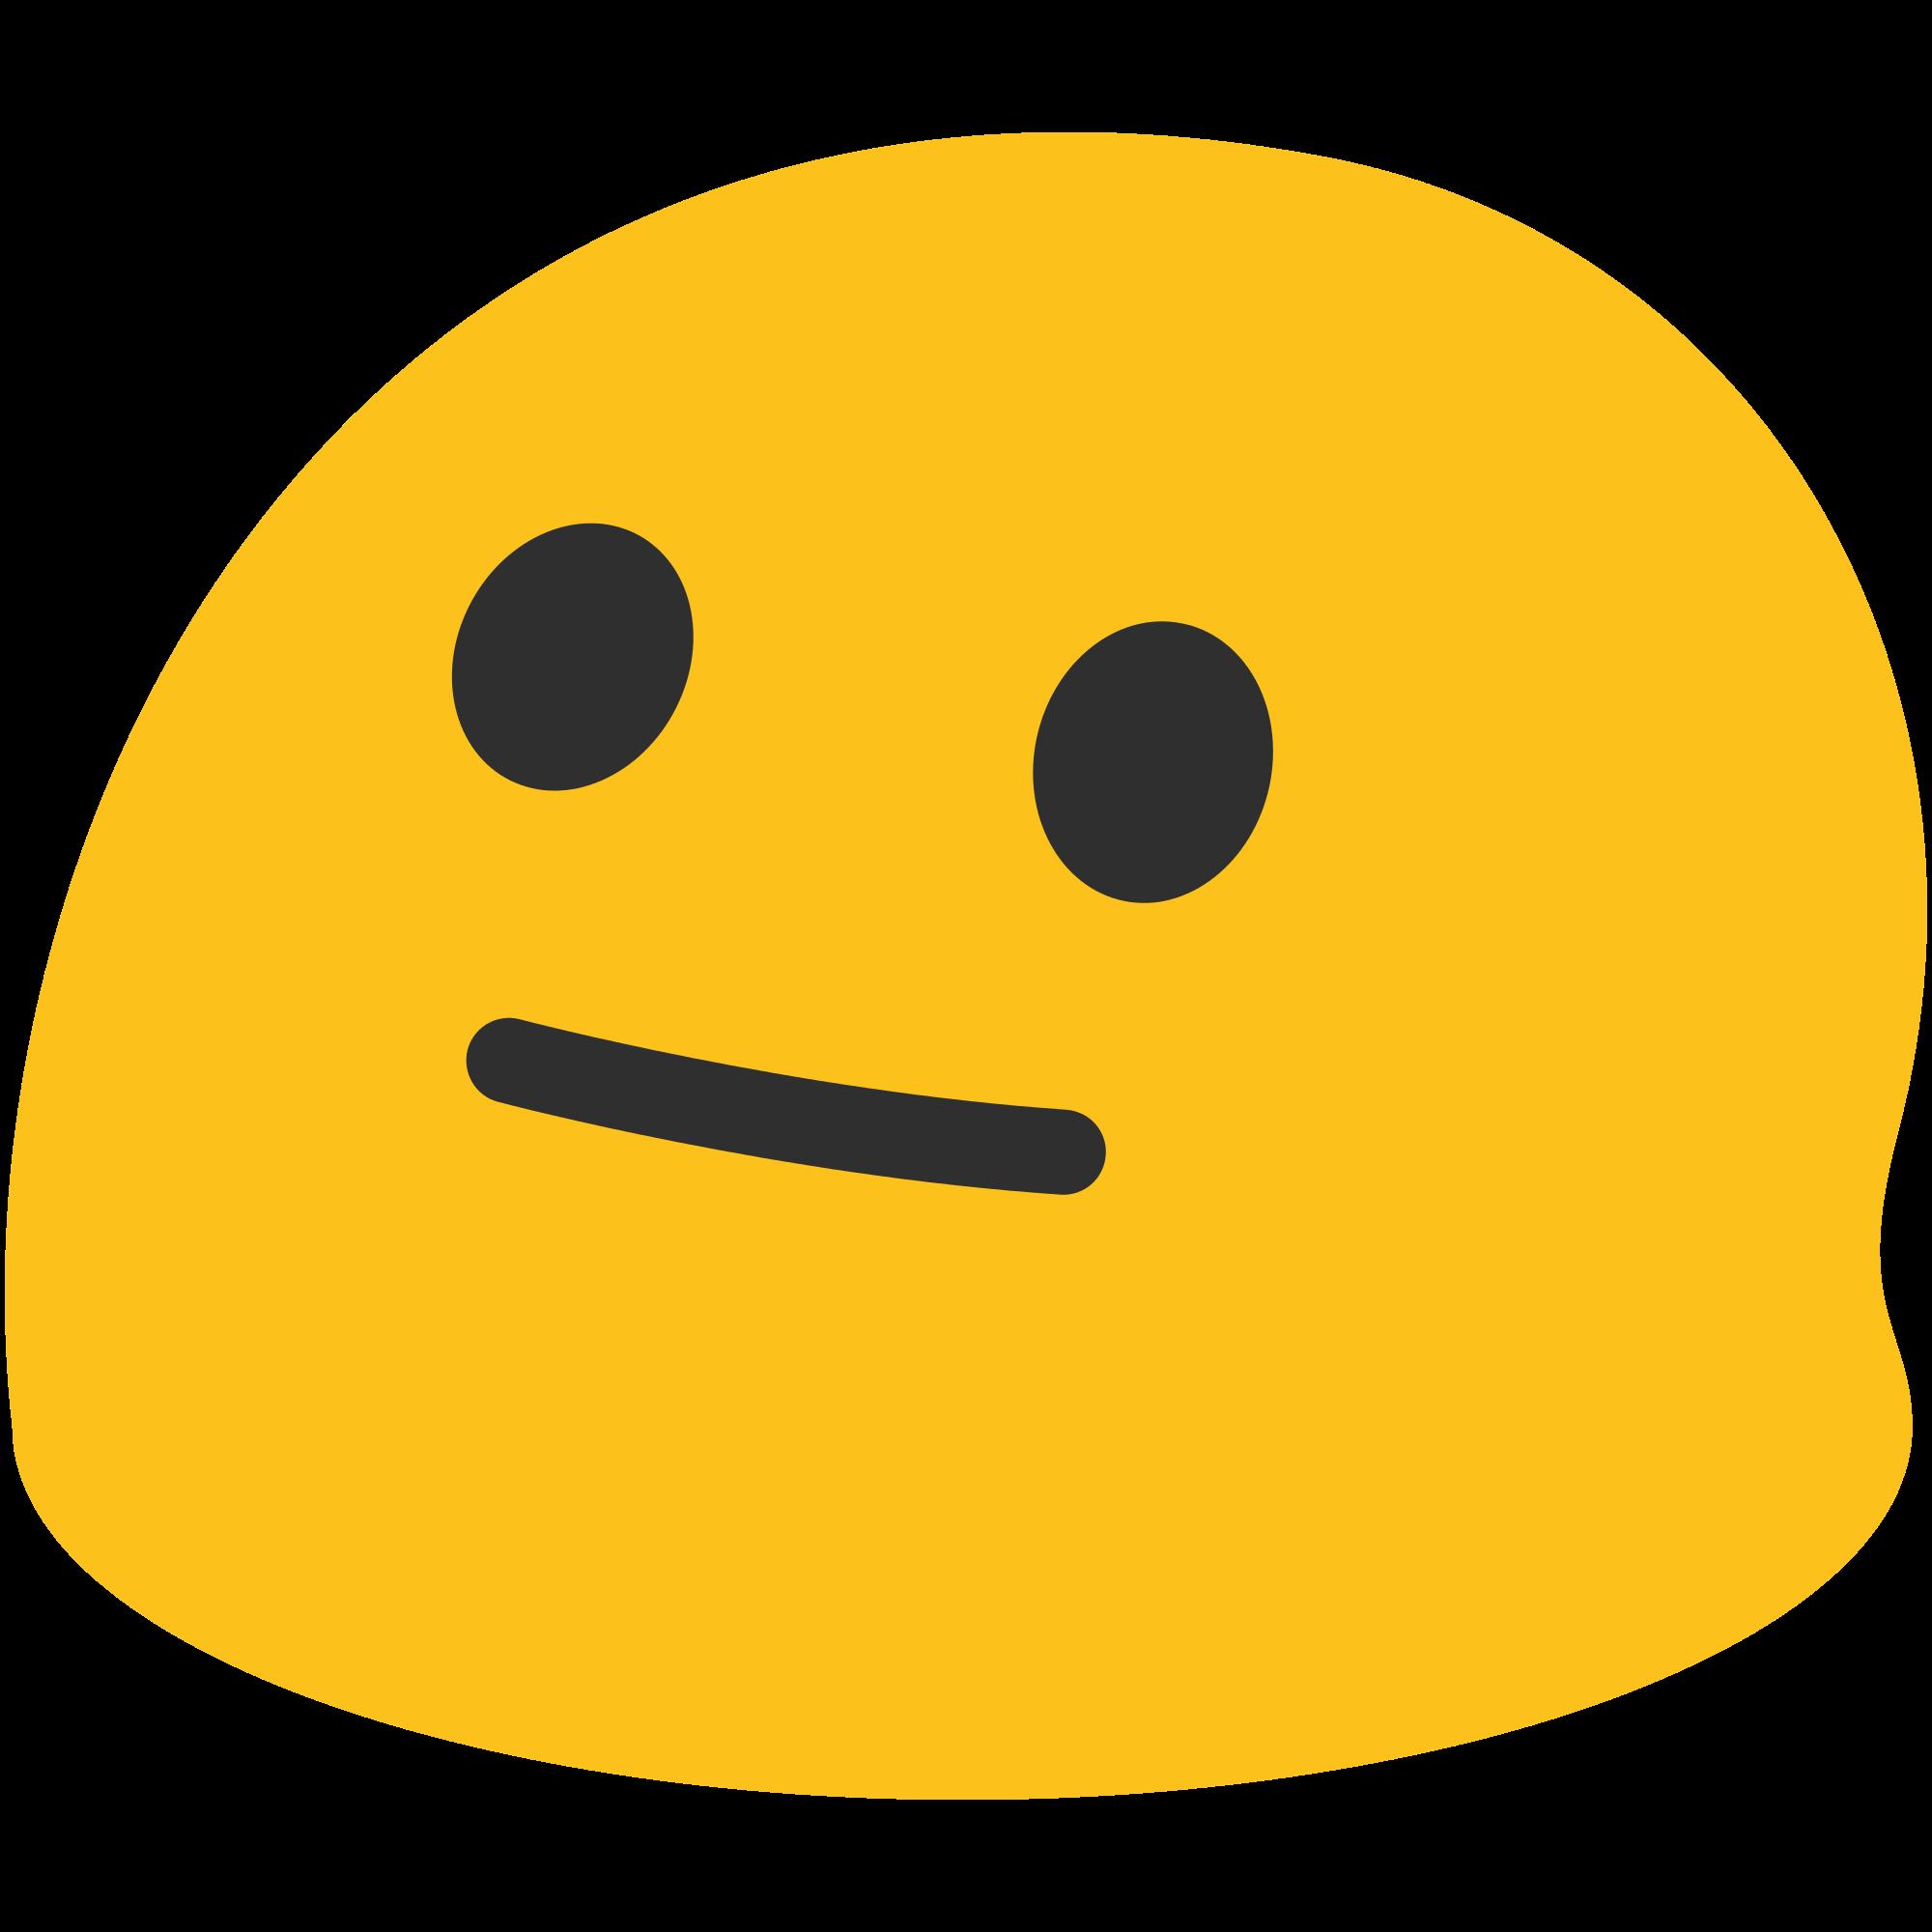 Emoji clipart simple. English wikipedia the free